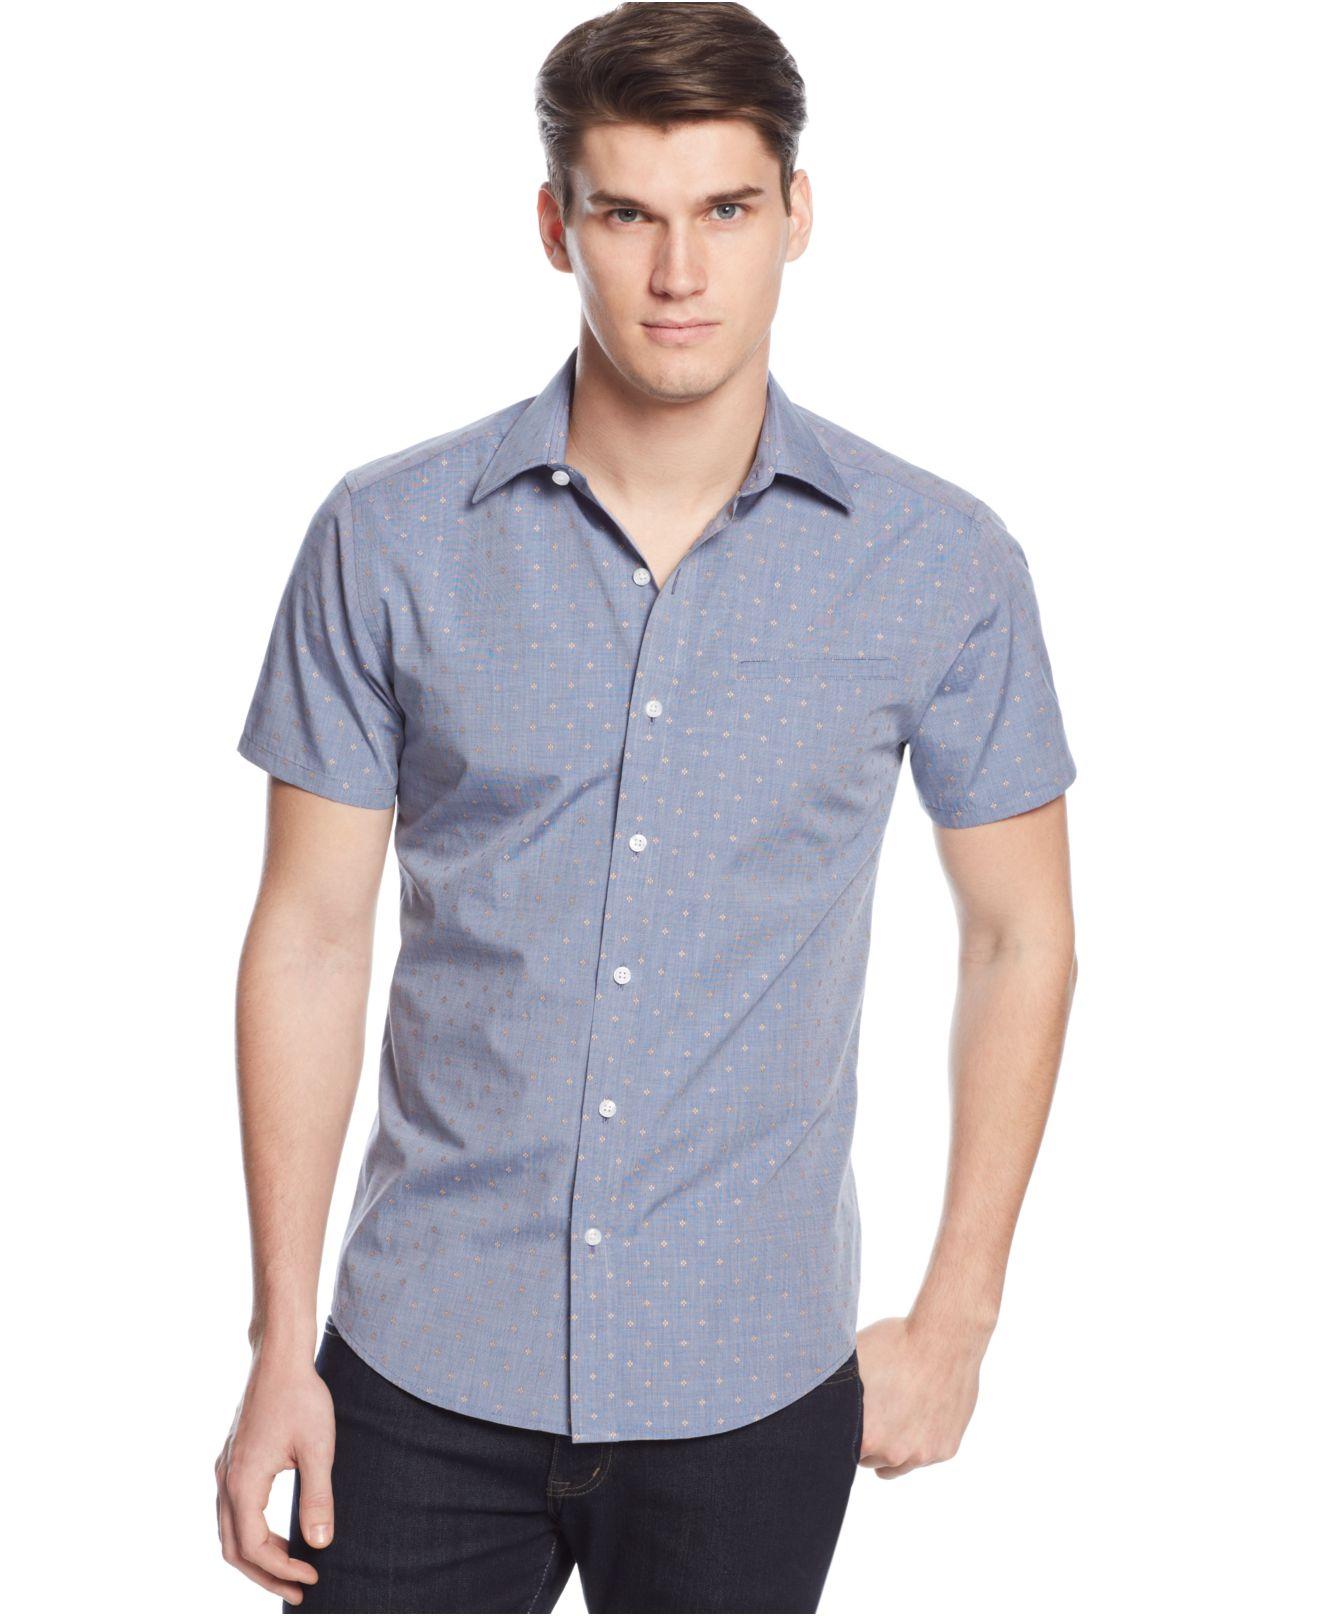 Vince camuto dobby chambray shirt in blue for men for Men s dobby shirt